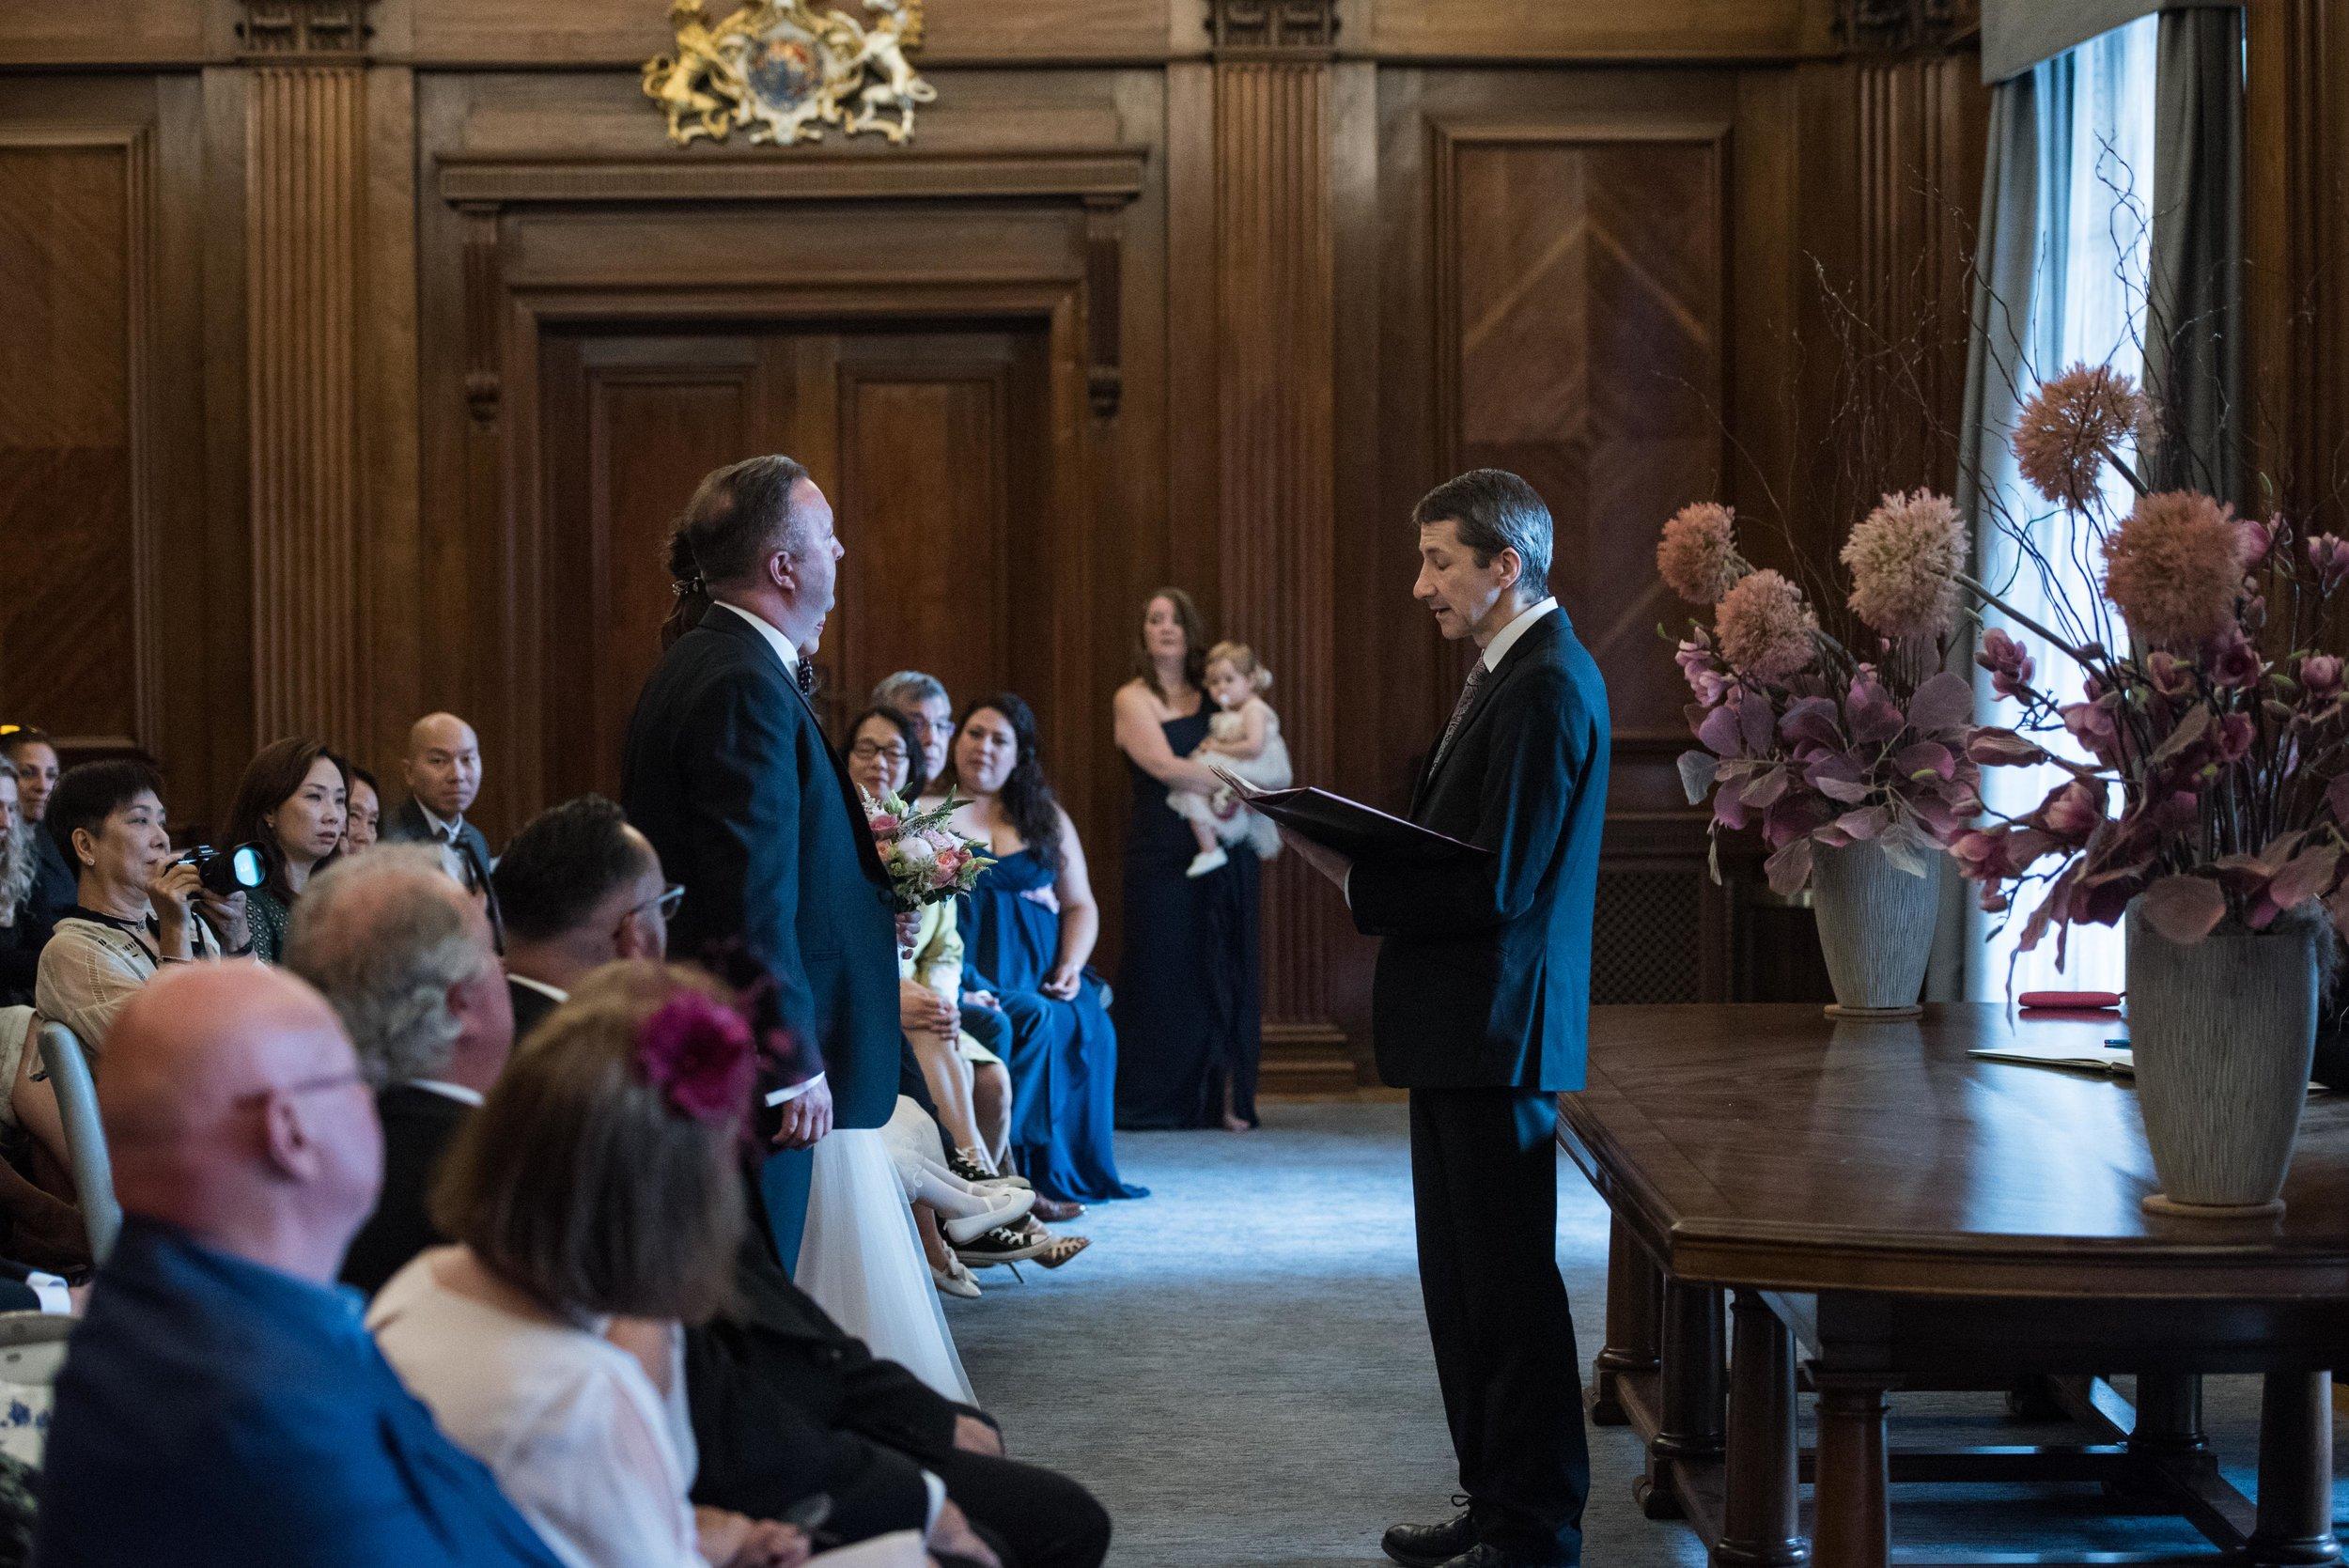 D&M_Marylebone Town Hall Wedding (95 of 239).jpg